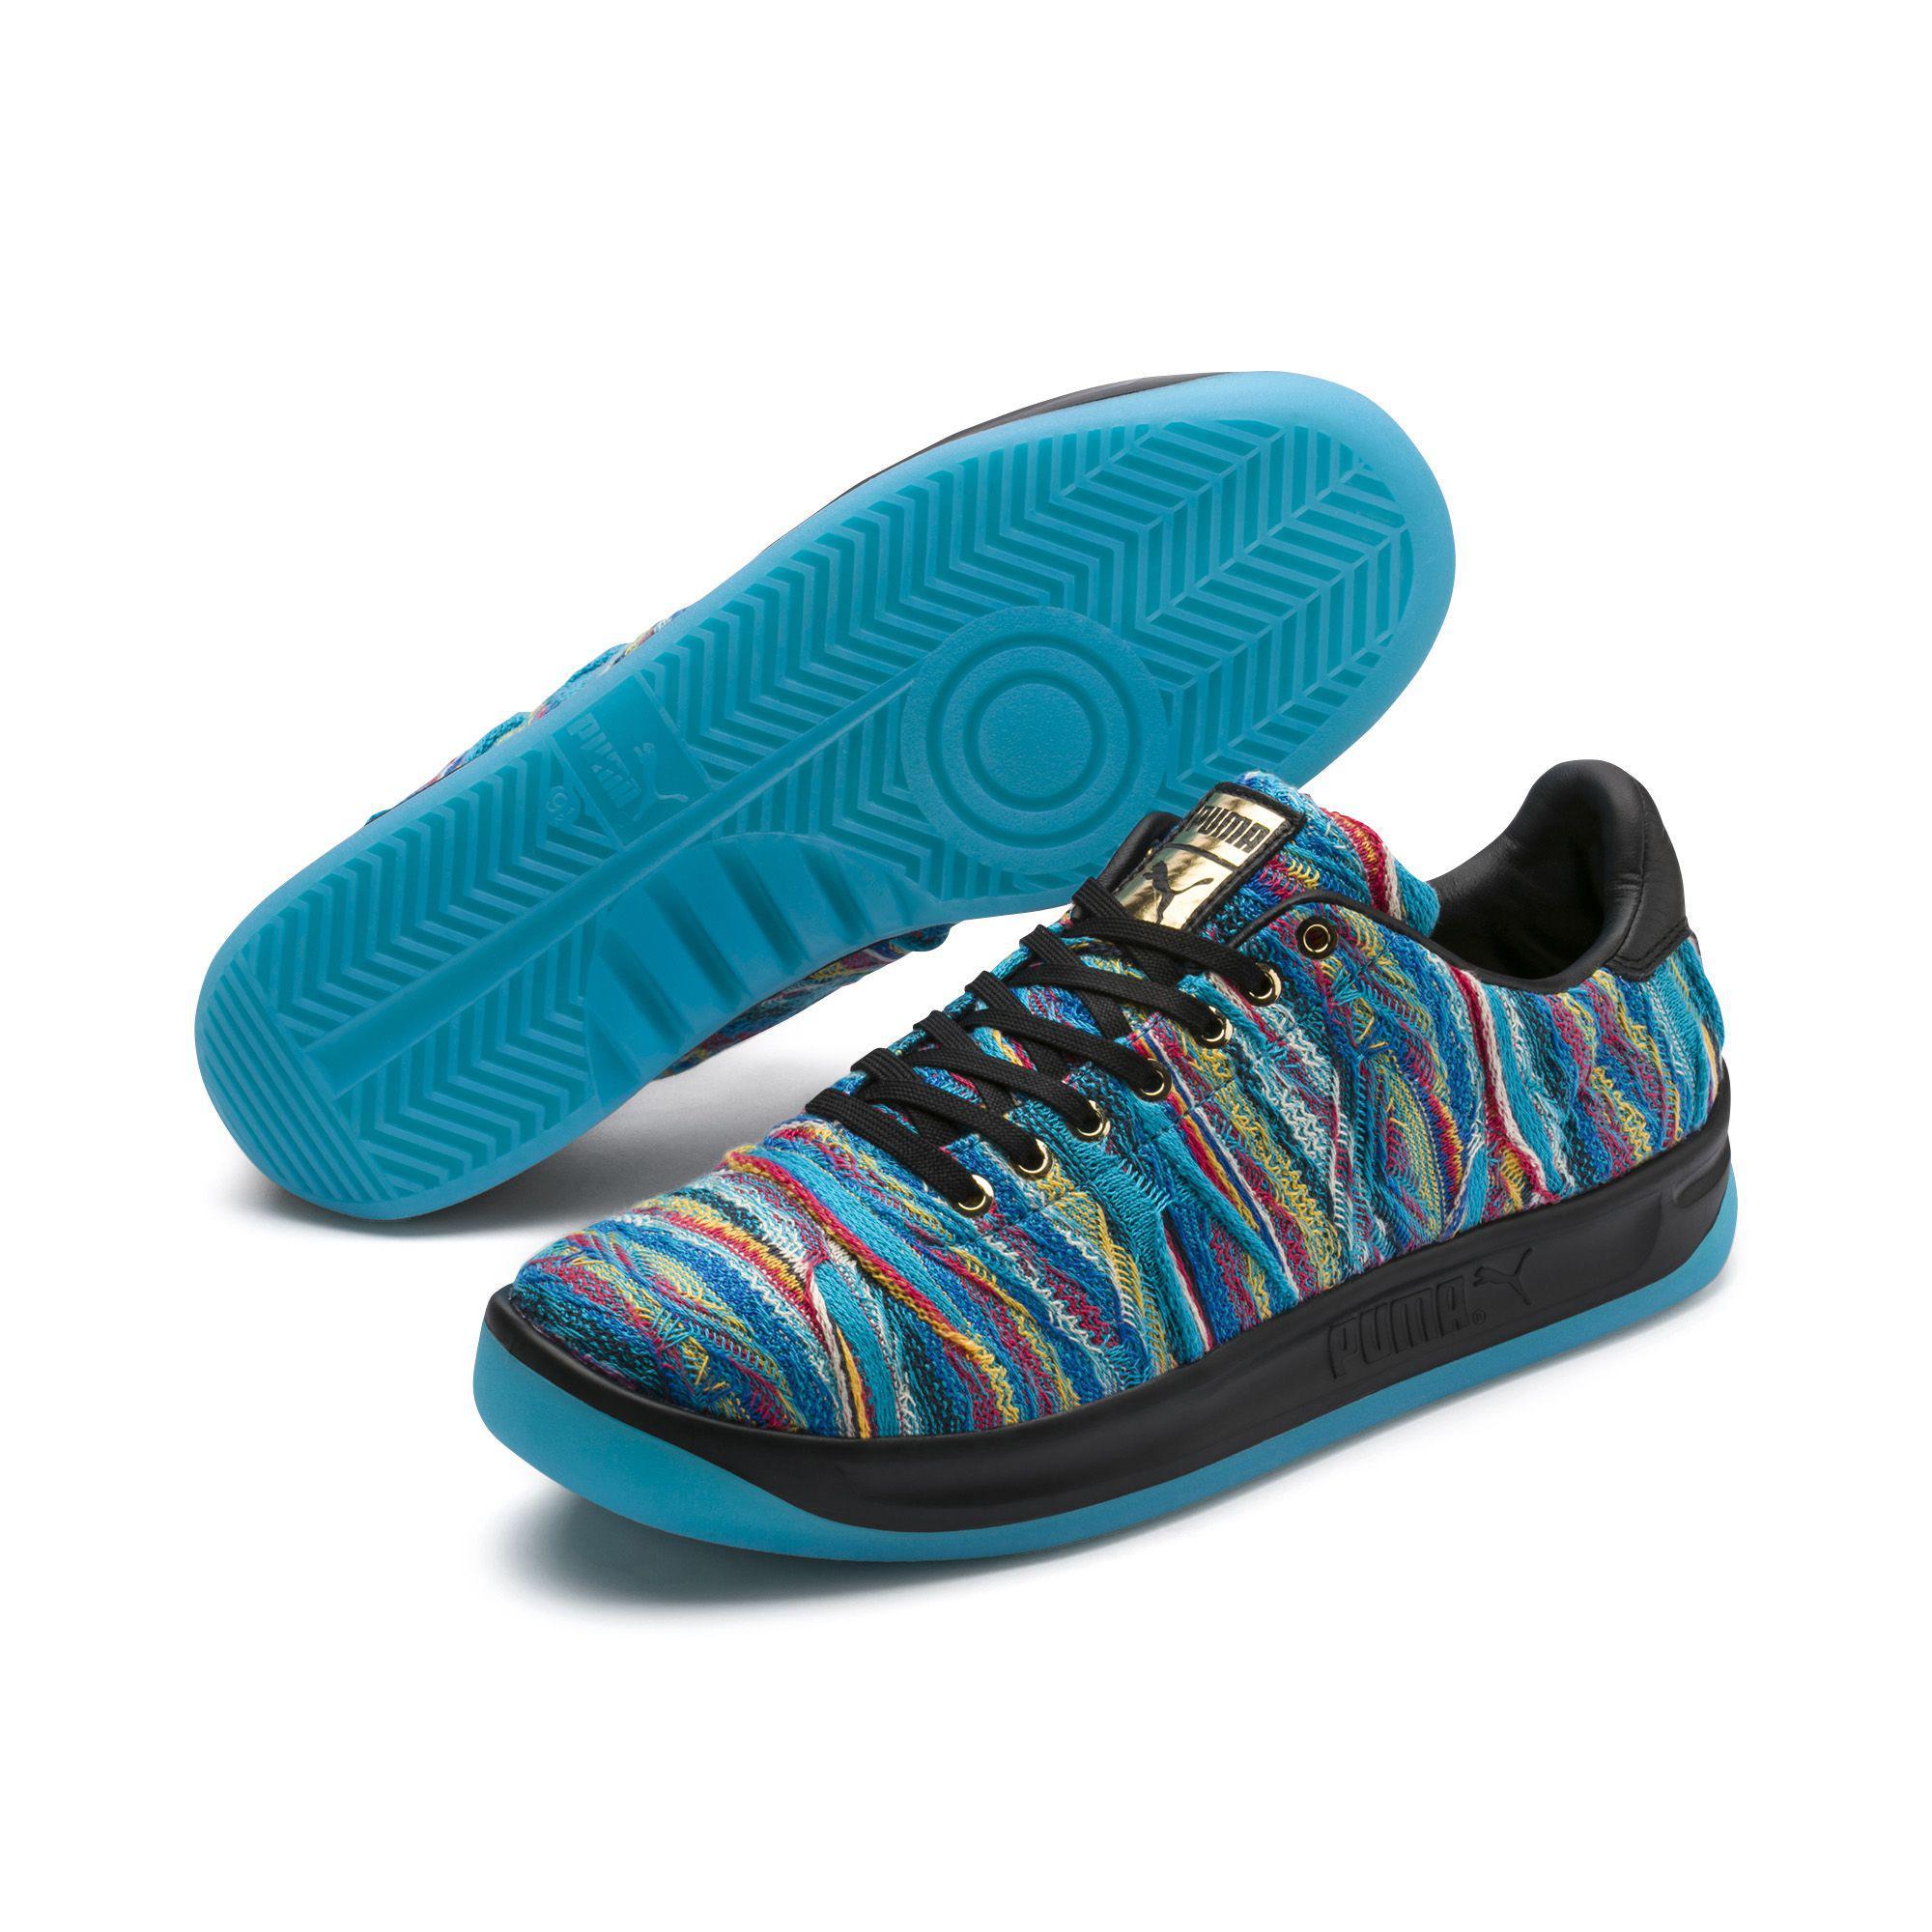 398d502be7c0 Lyst - PUMA X Coogi California Unisex Sneakers in Blue for Men